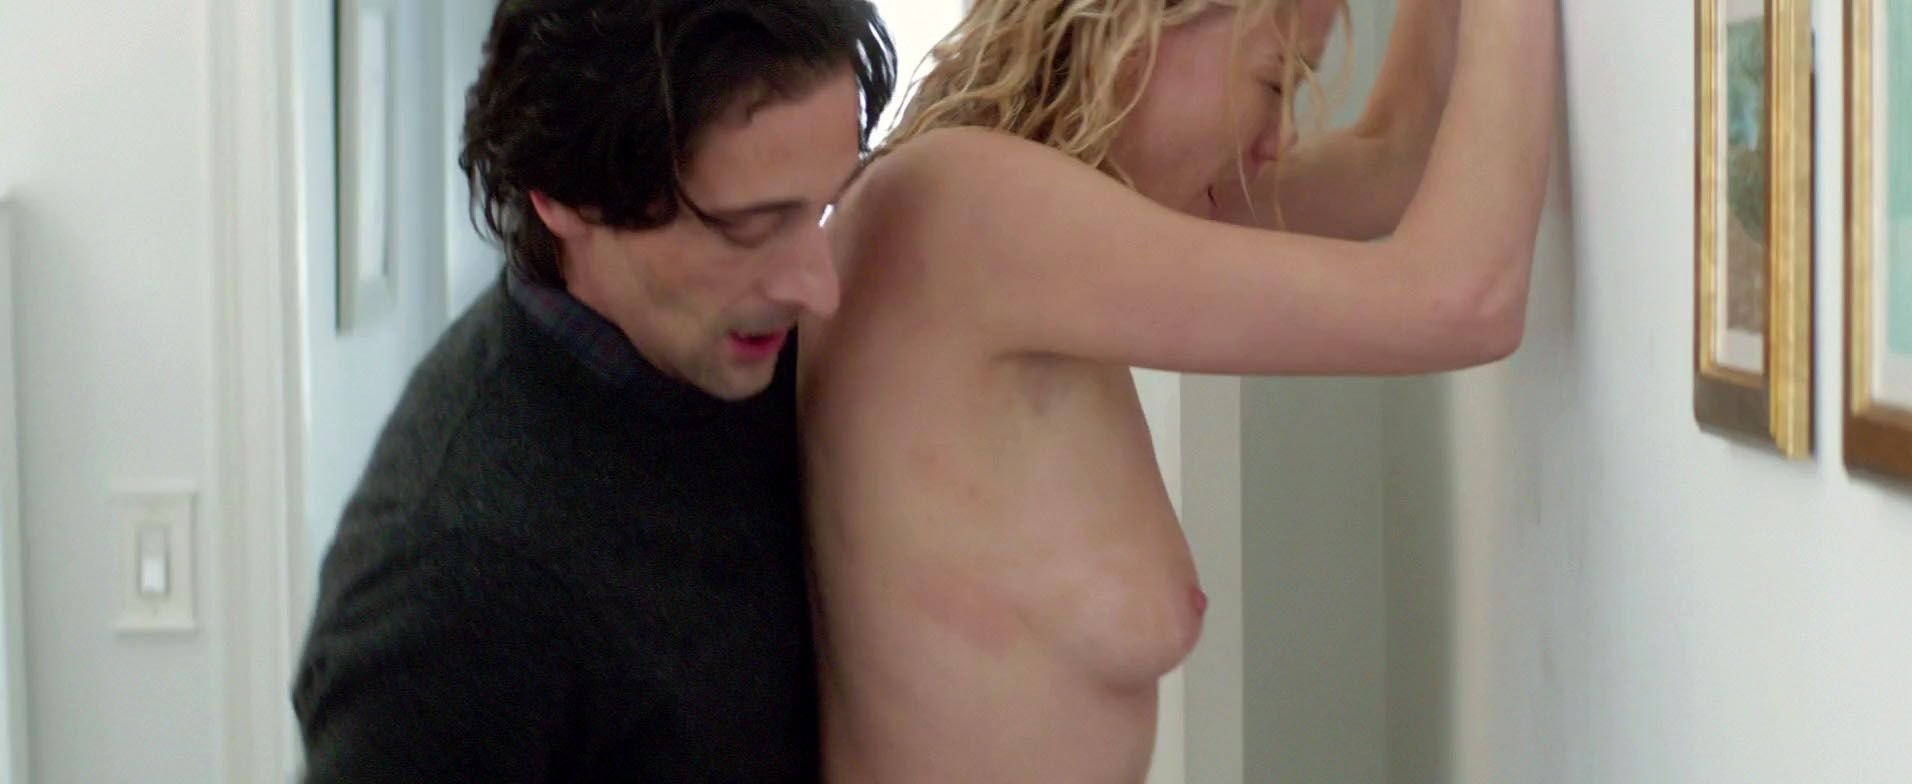 Yvonne Strahovski And Nude 5